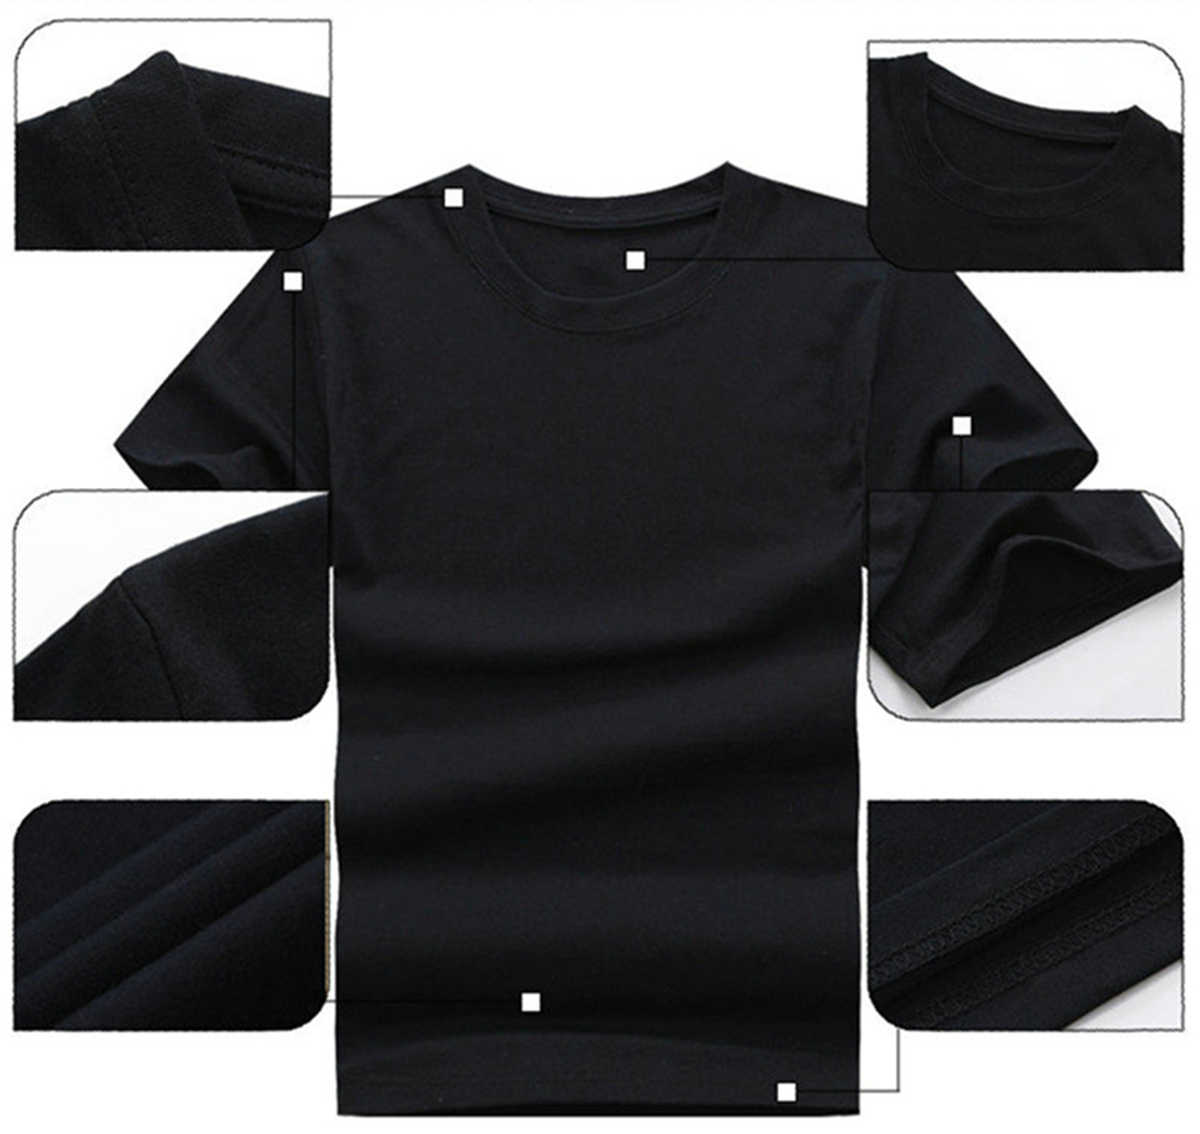 Gildan Brand Reel Cool Pap Fishing The Big Fish T-Shirt Men's Short Sleeve T-Shirt